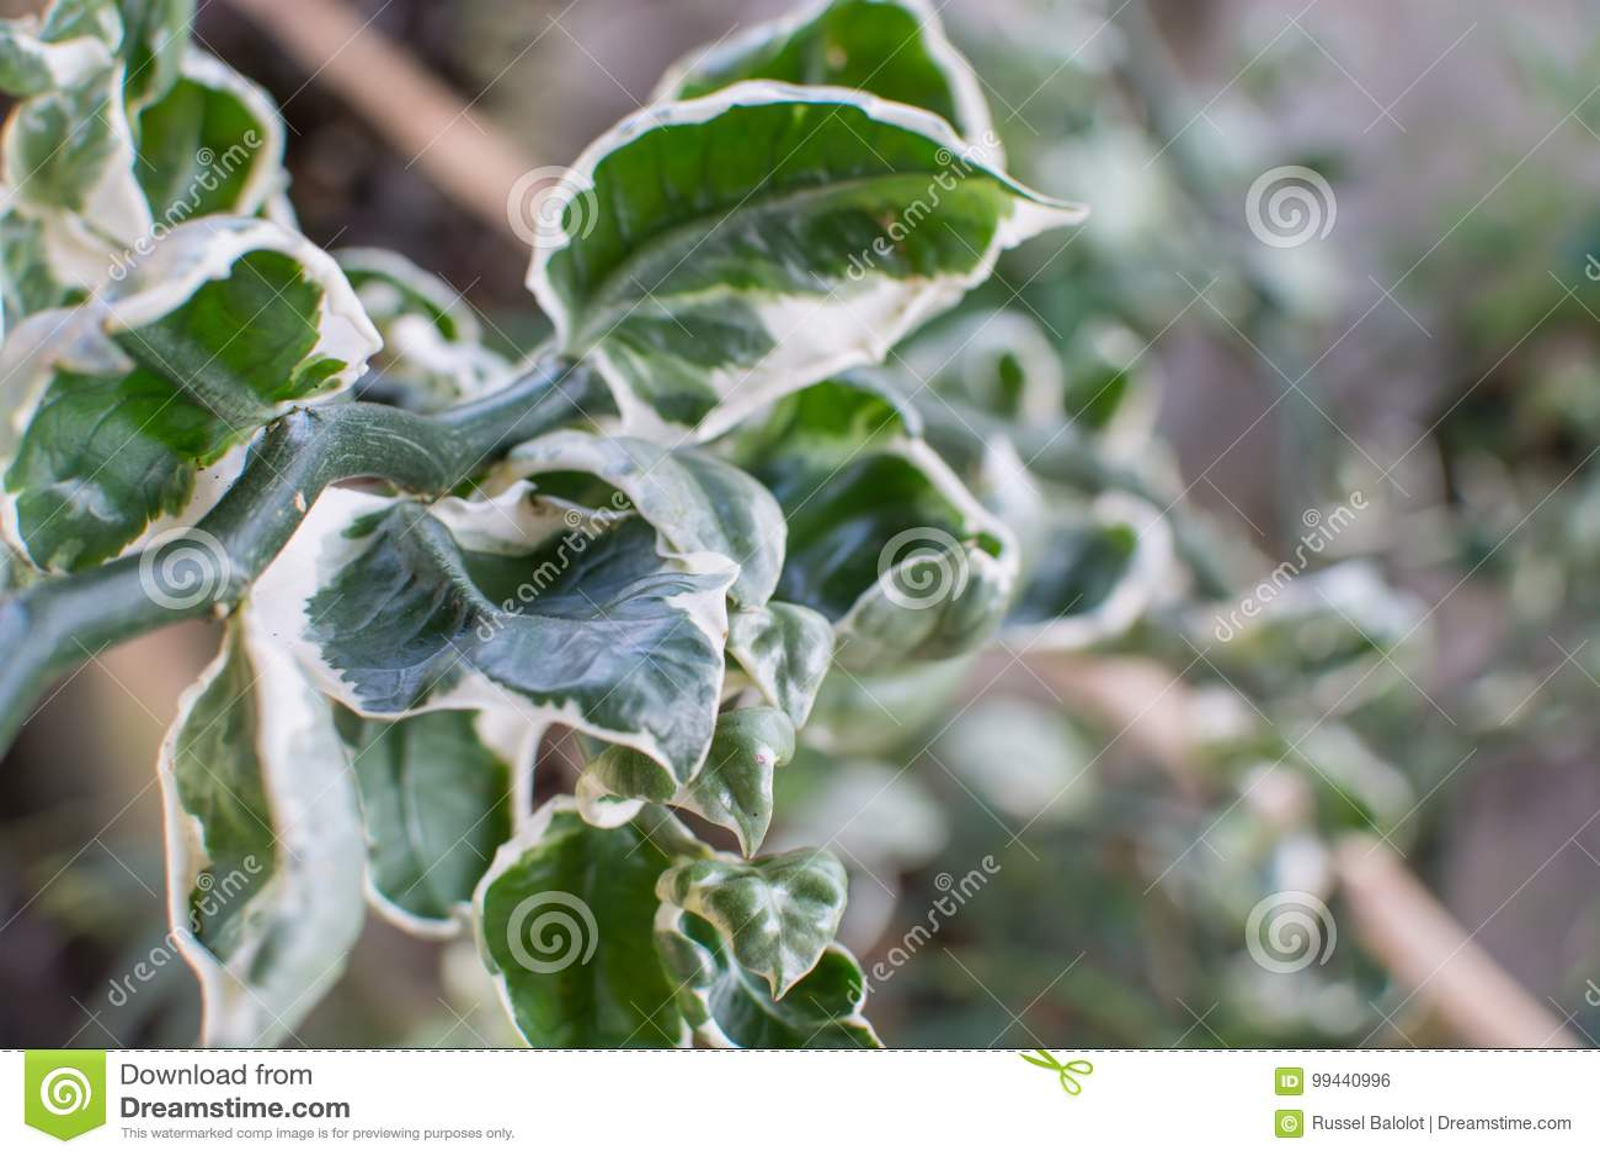 Groene witte bladeren